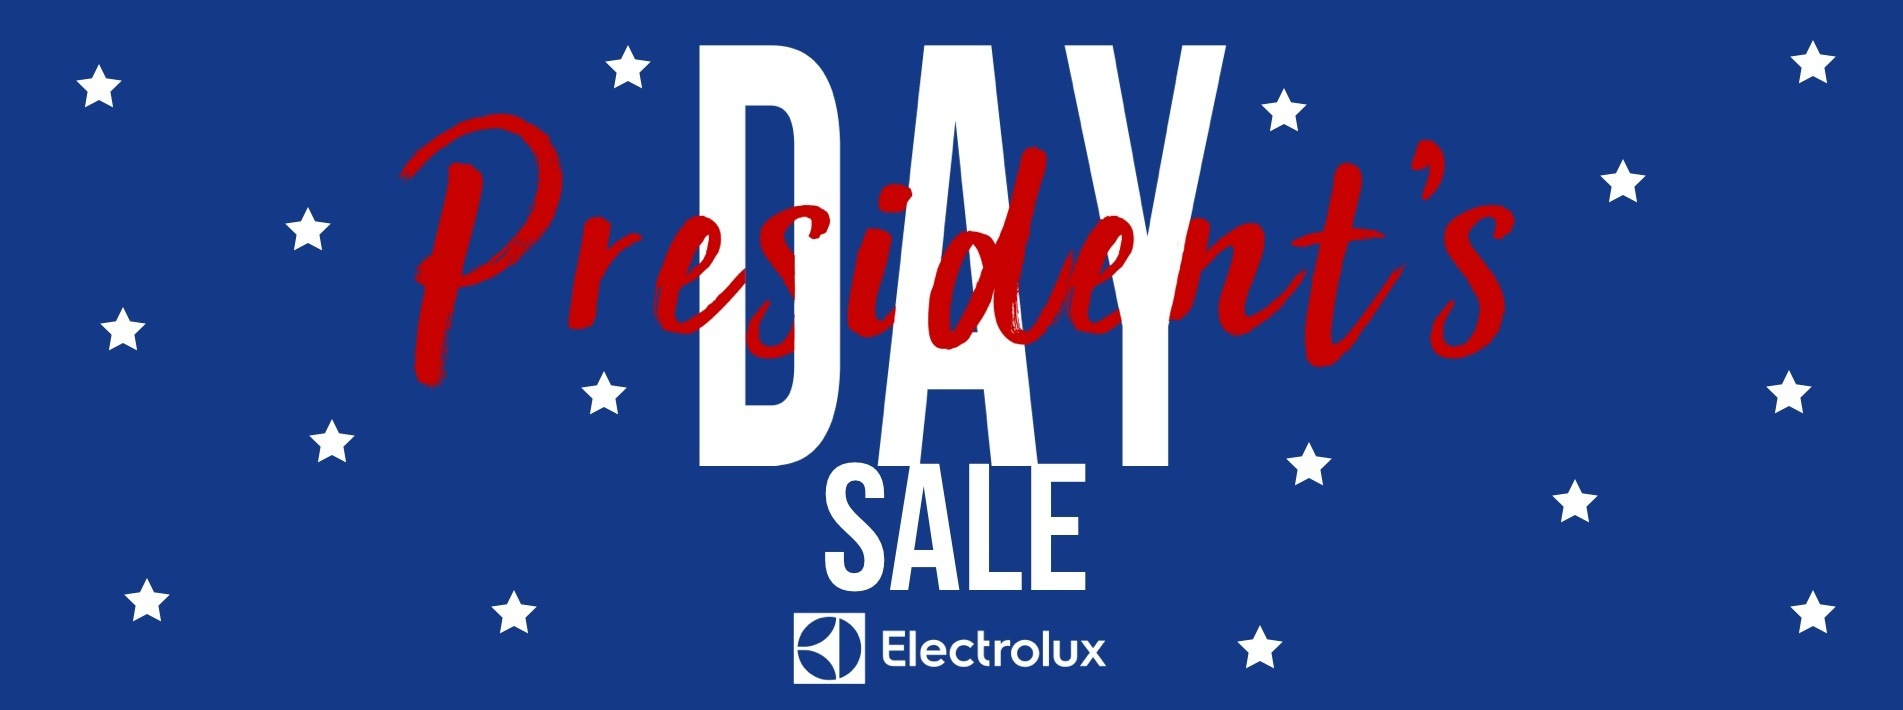 Electrolux-Presidents-Day-2021